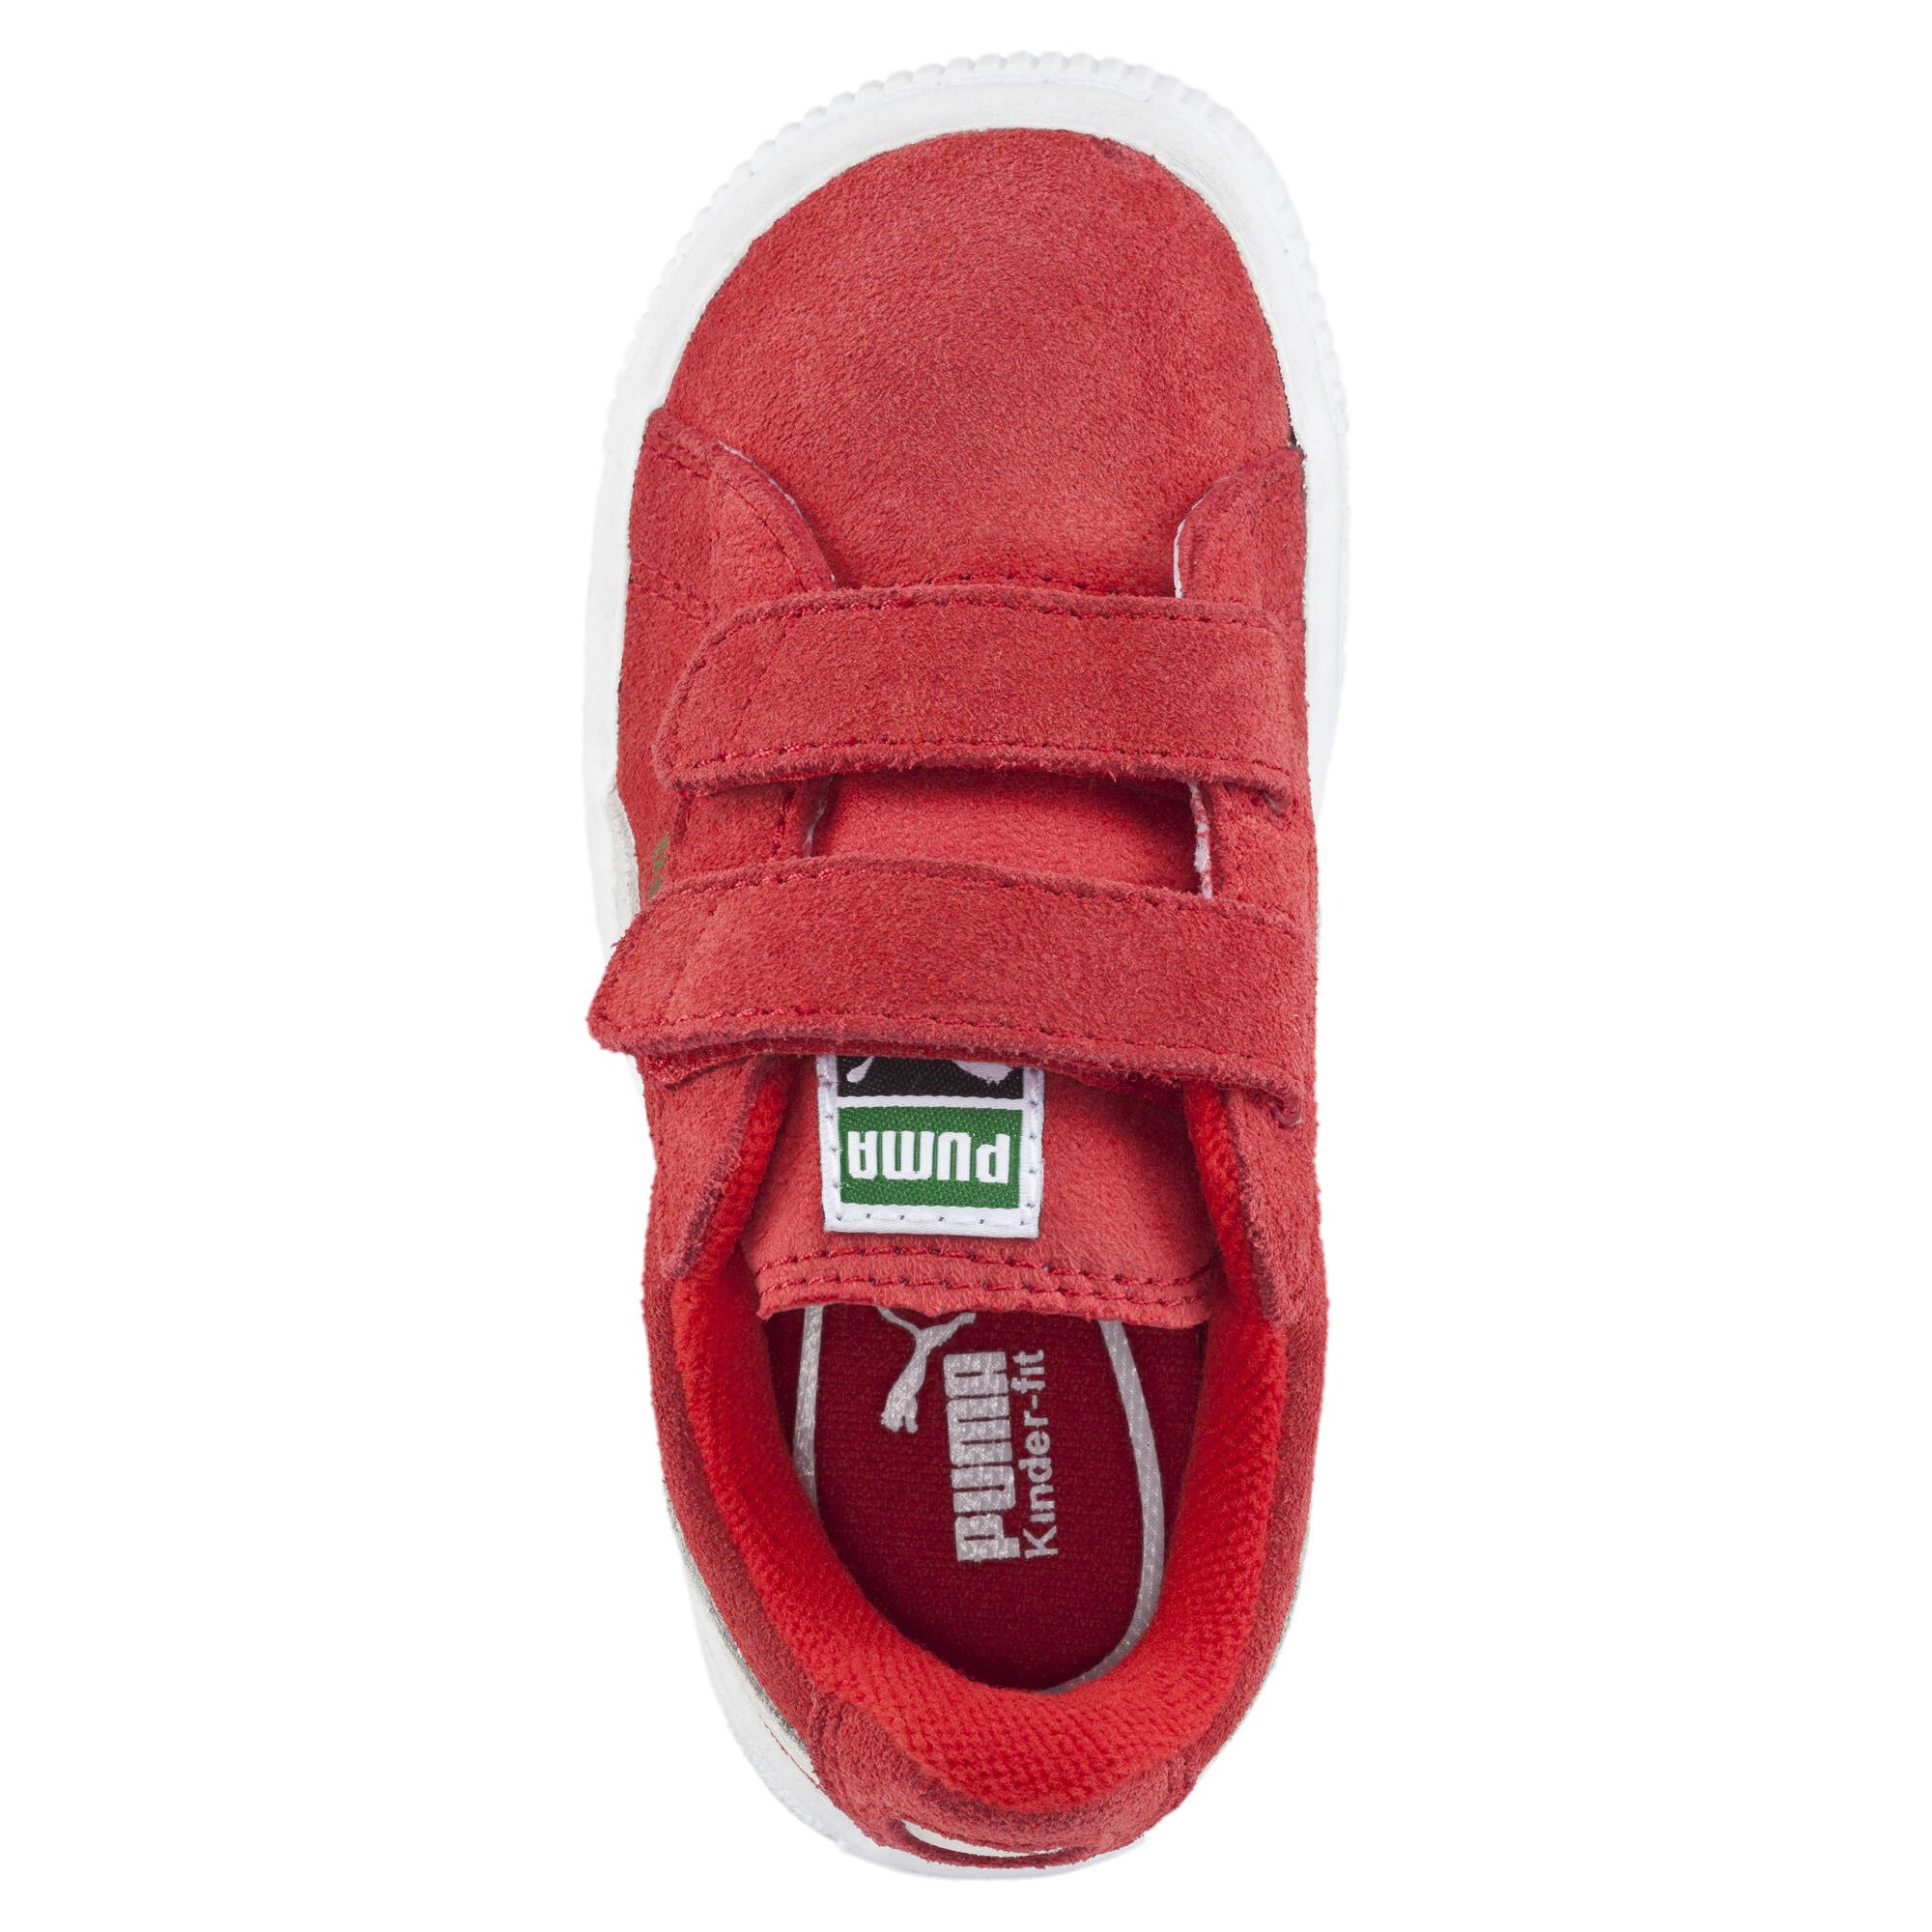 PUMA-Suede-AC-Toddler-Shoes-Kids-Shoe-Kids thumbnail 6